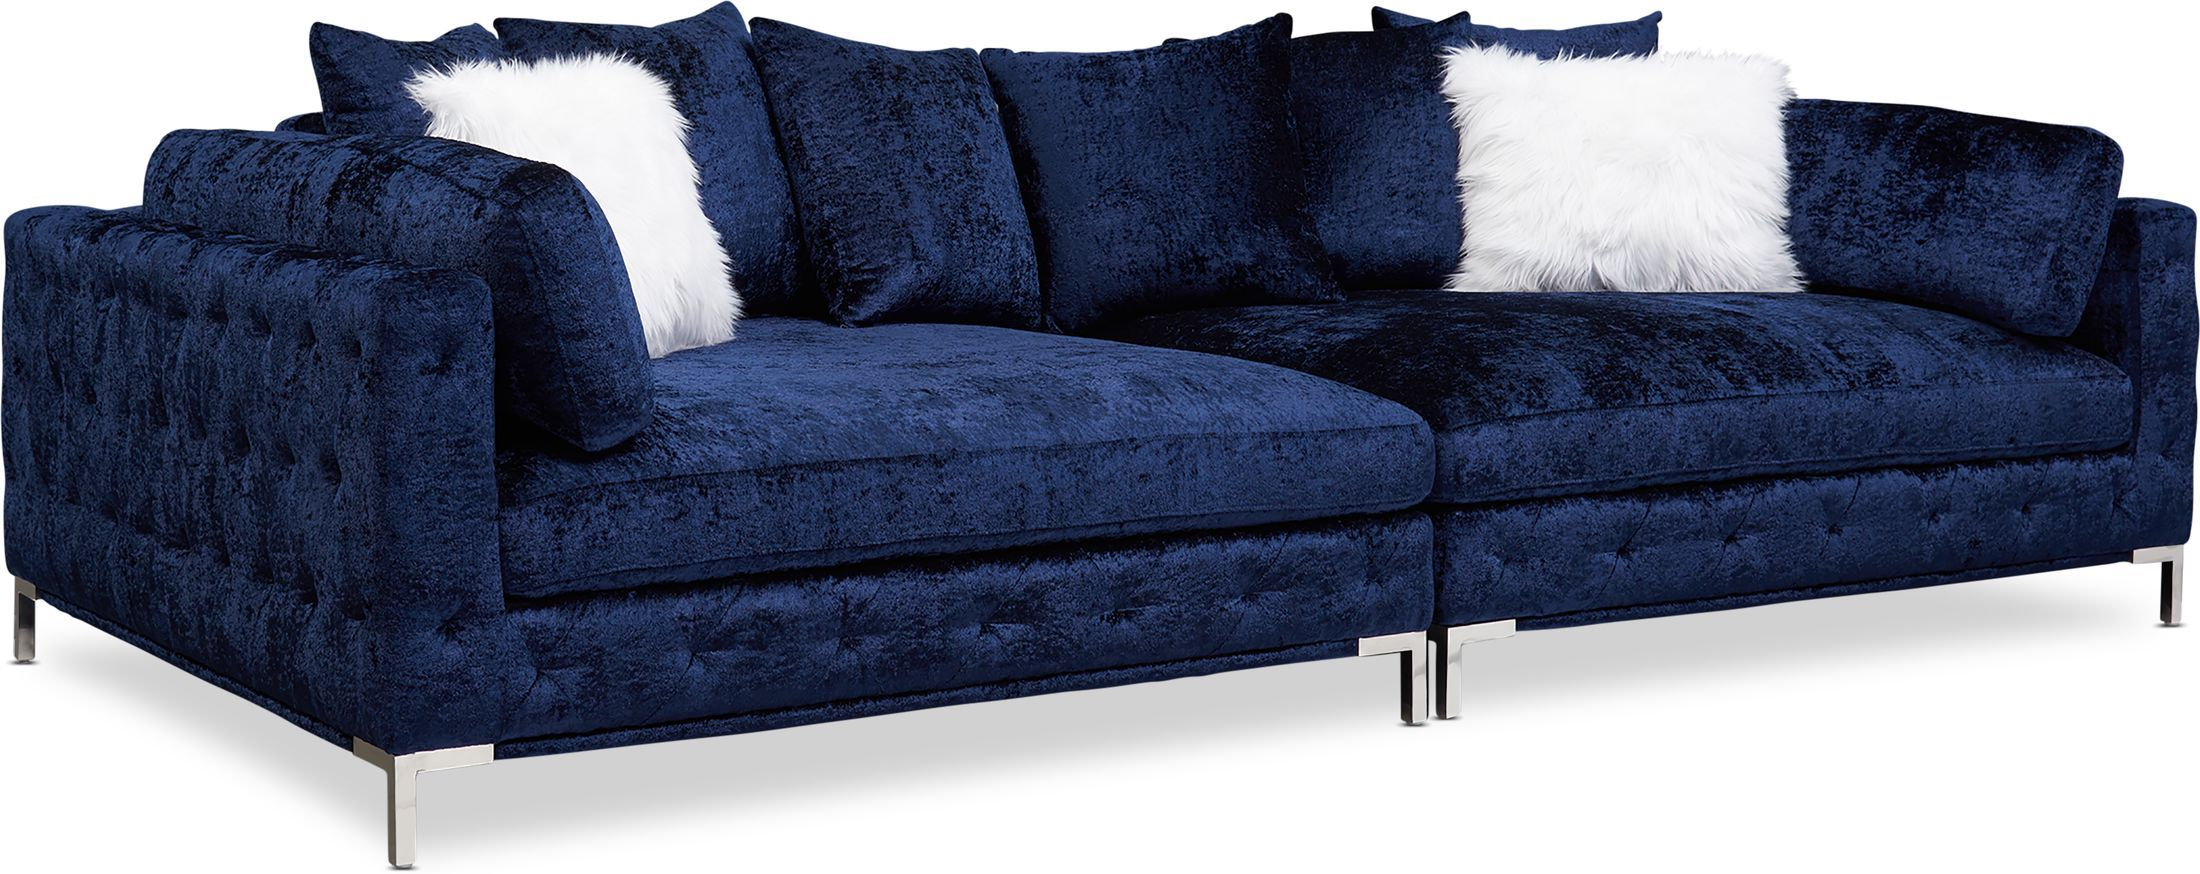 Milan 2 Piece Sofa Midnight In 2021 Value City Furniture American Signature Furniture City Furniture